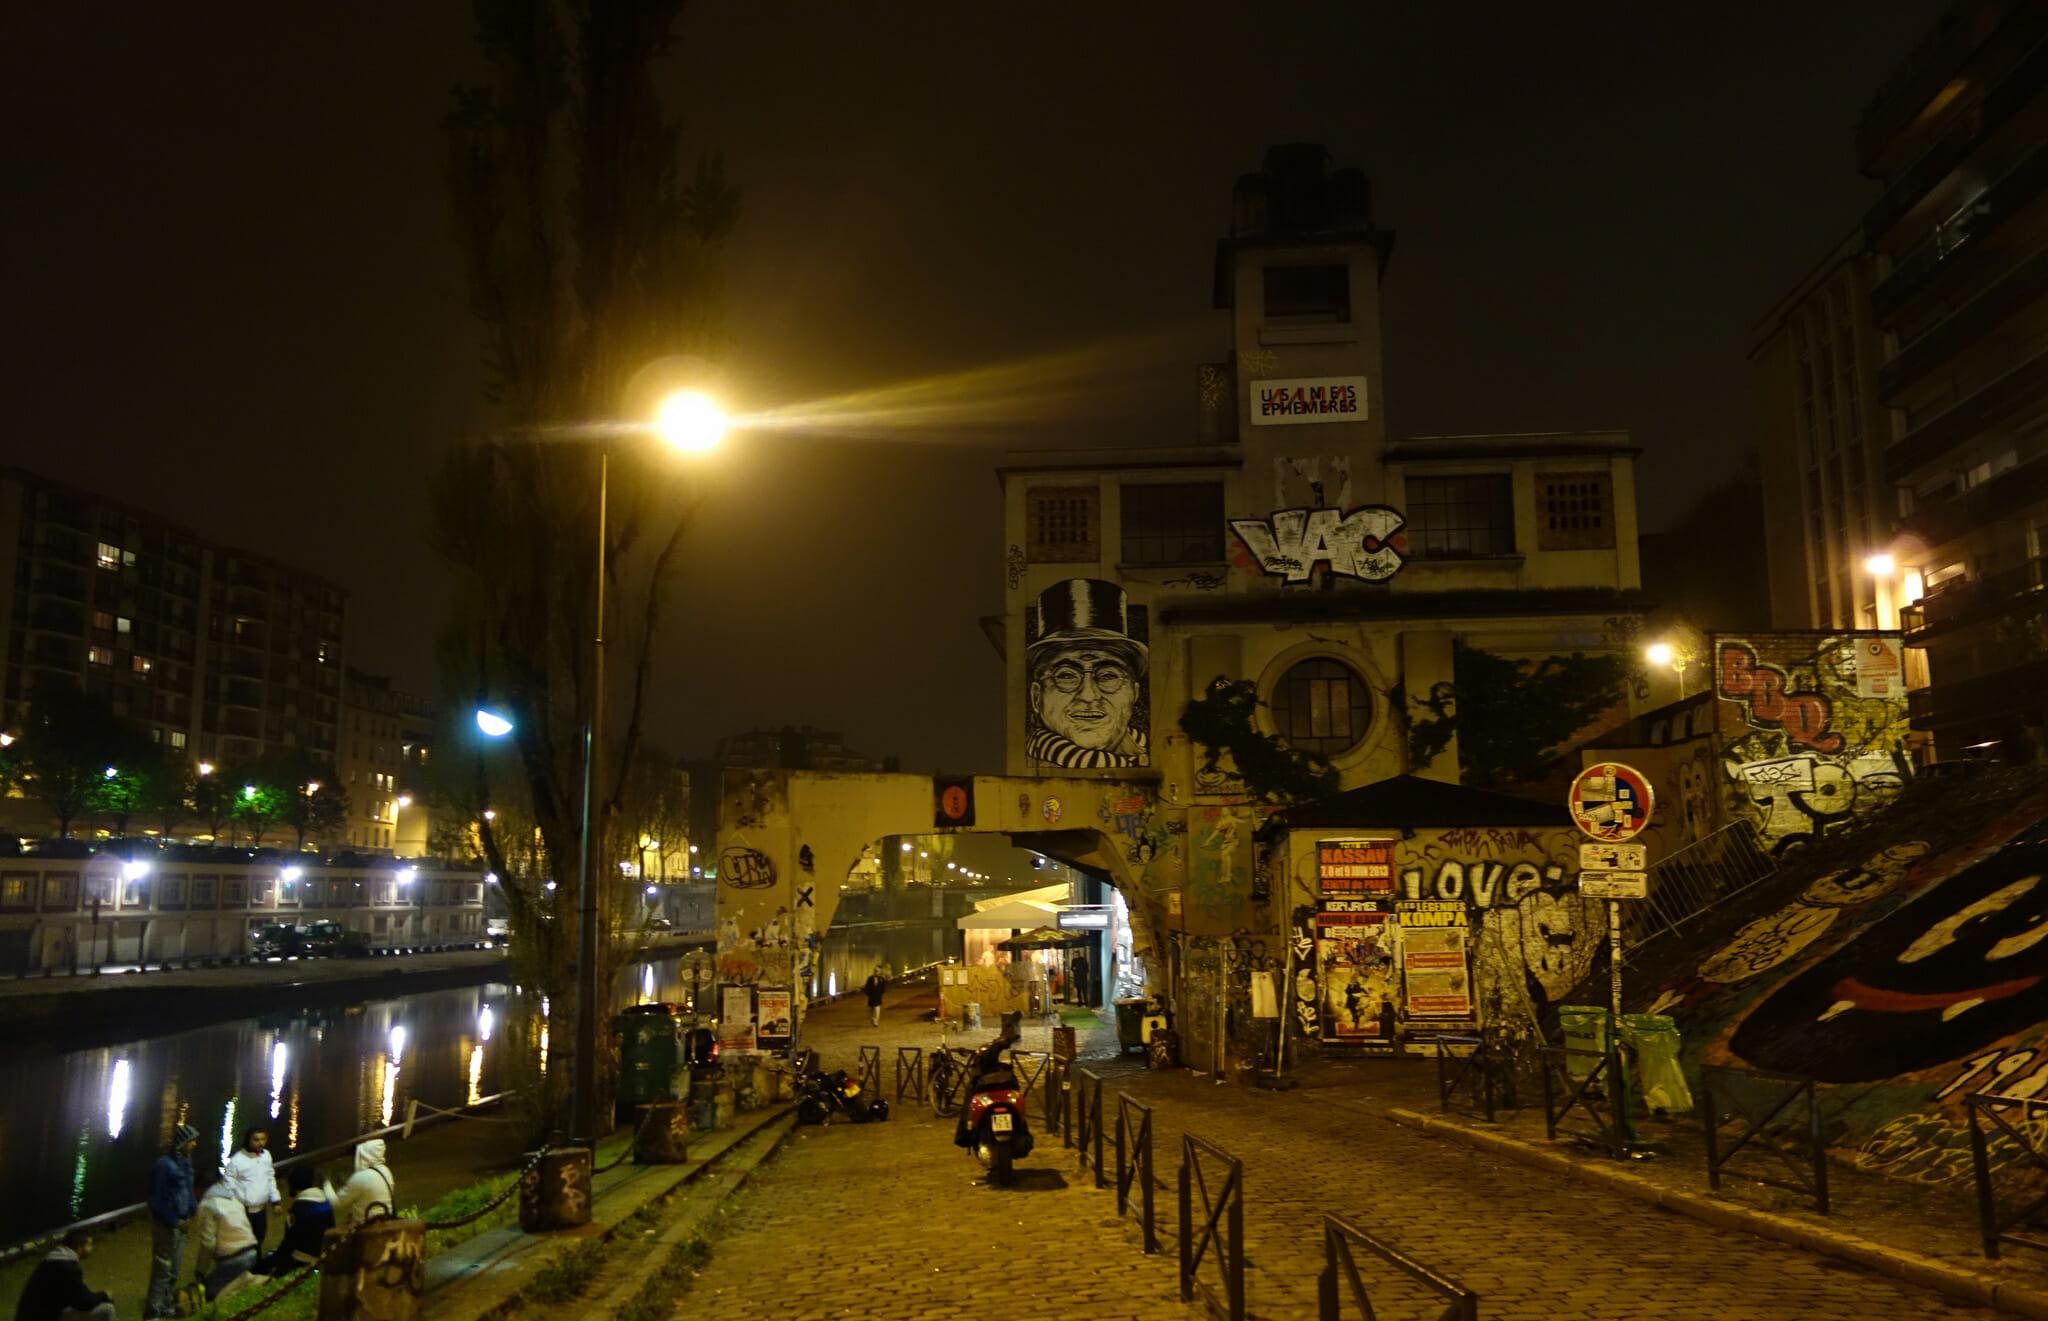 Point Éphémère, a music venue and café along the Canal St-Martin, at night.